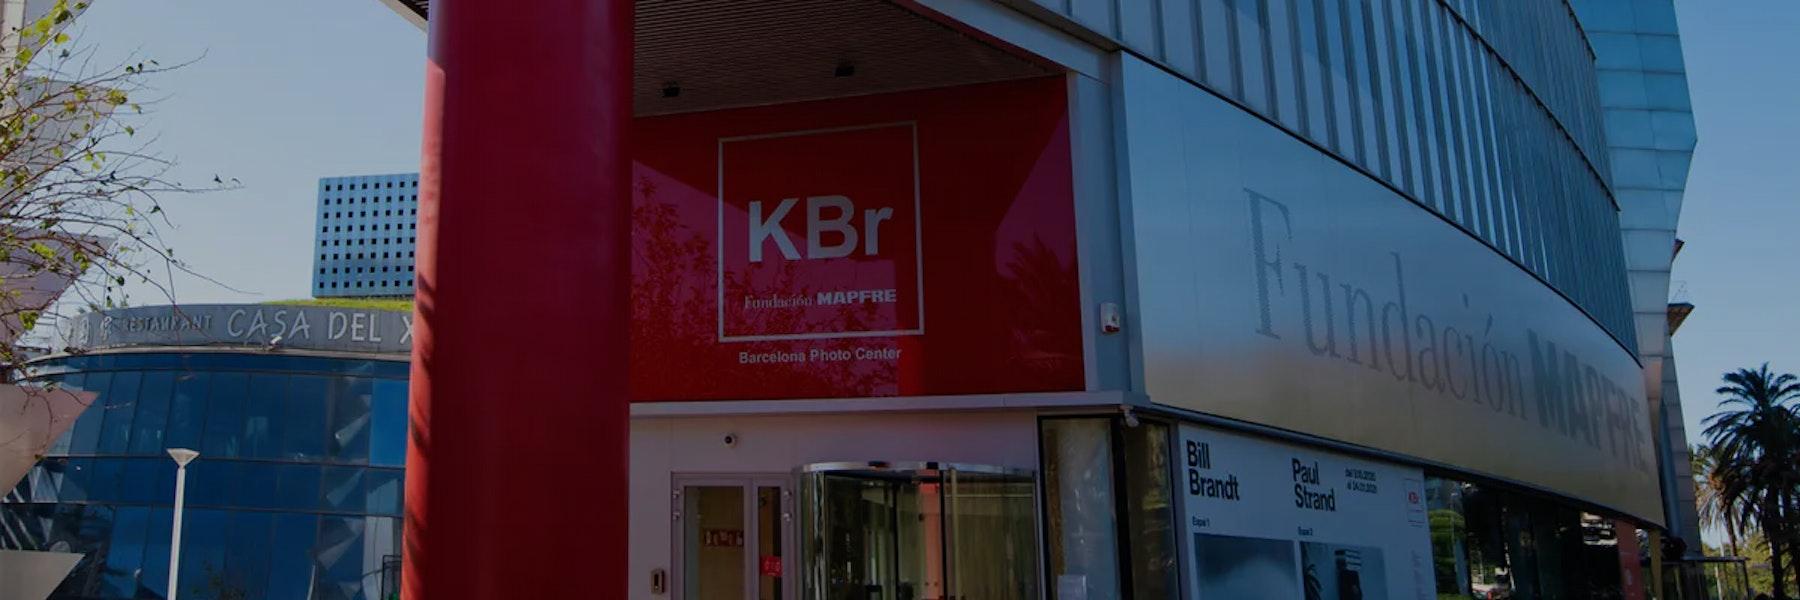 KBr Photography Center Barcelona